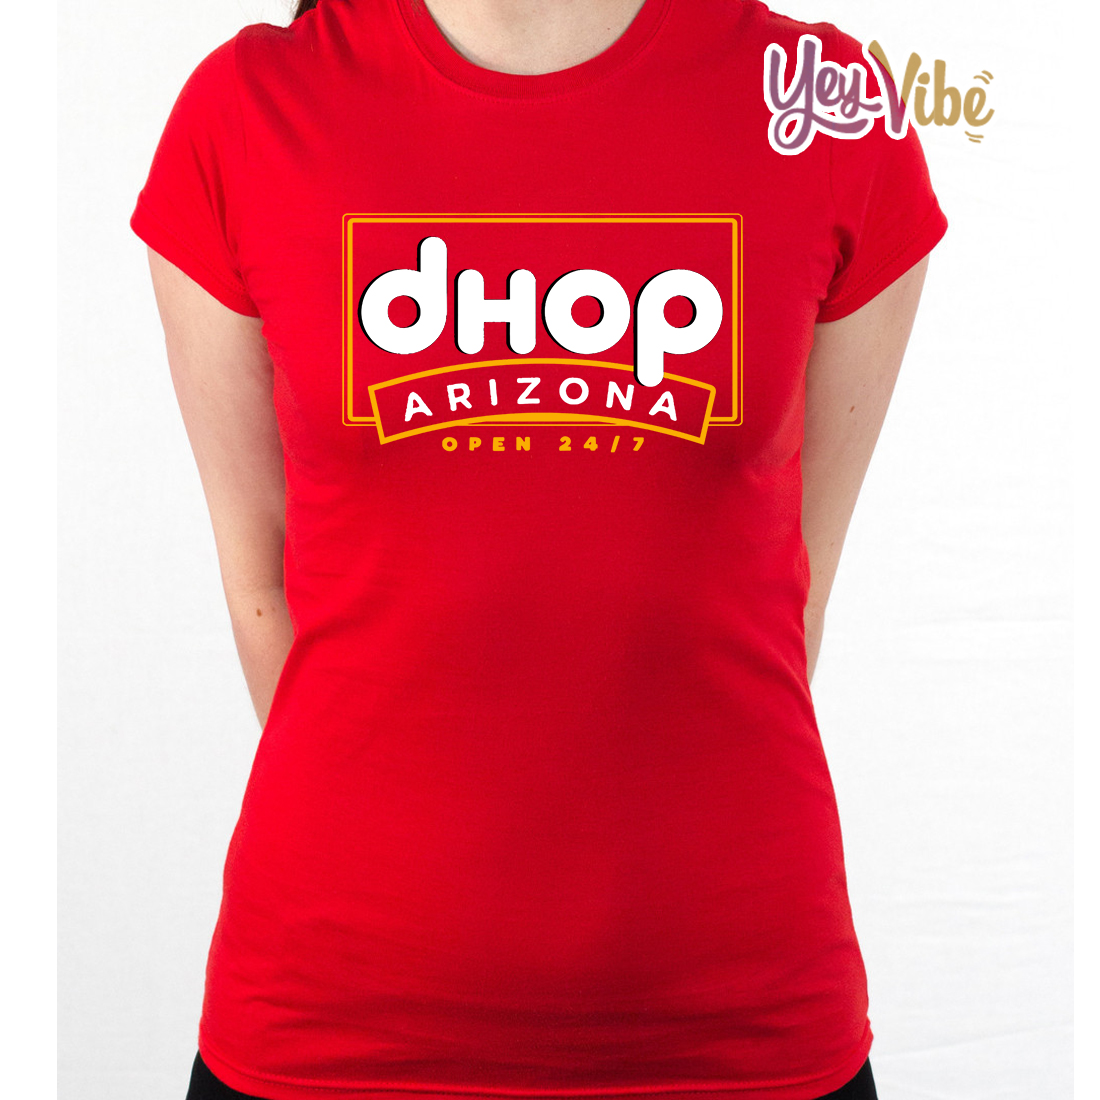 dHop Arizona Open 24-7 T-Shirts